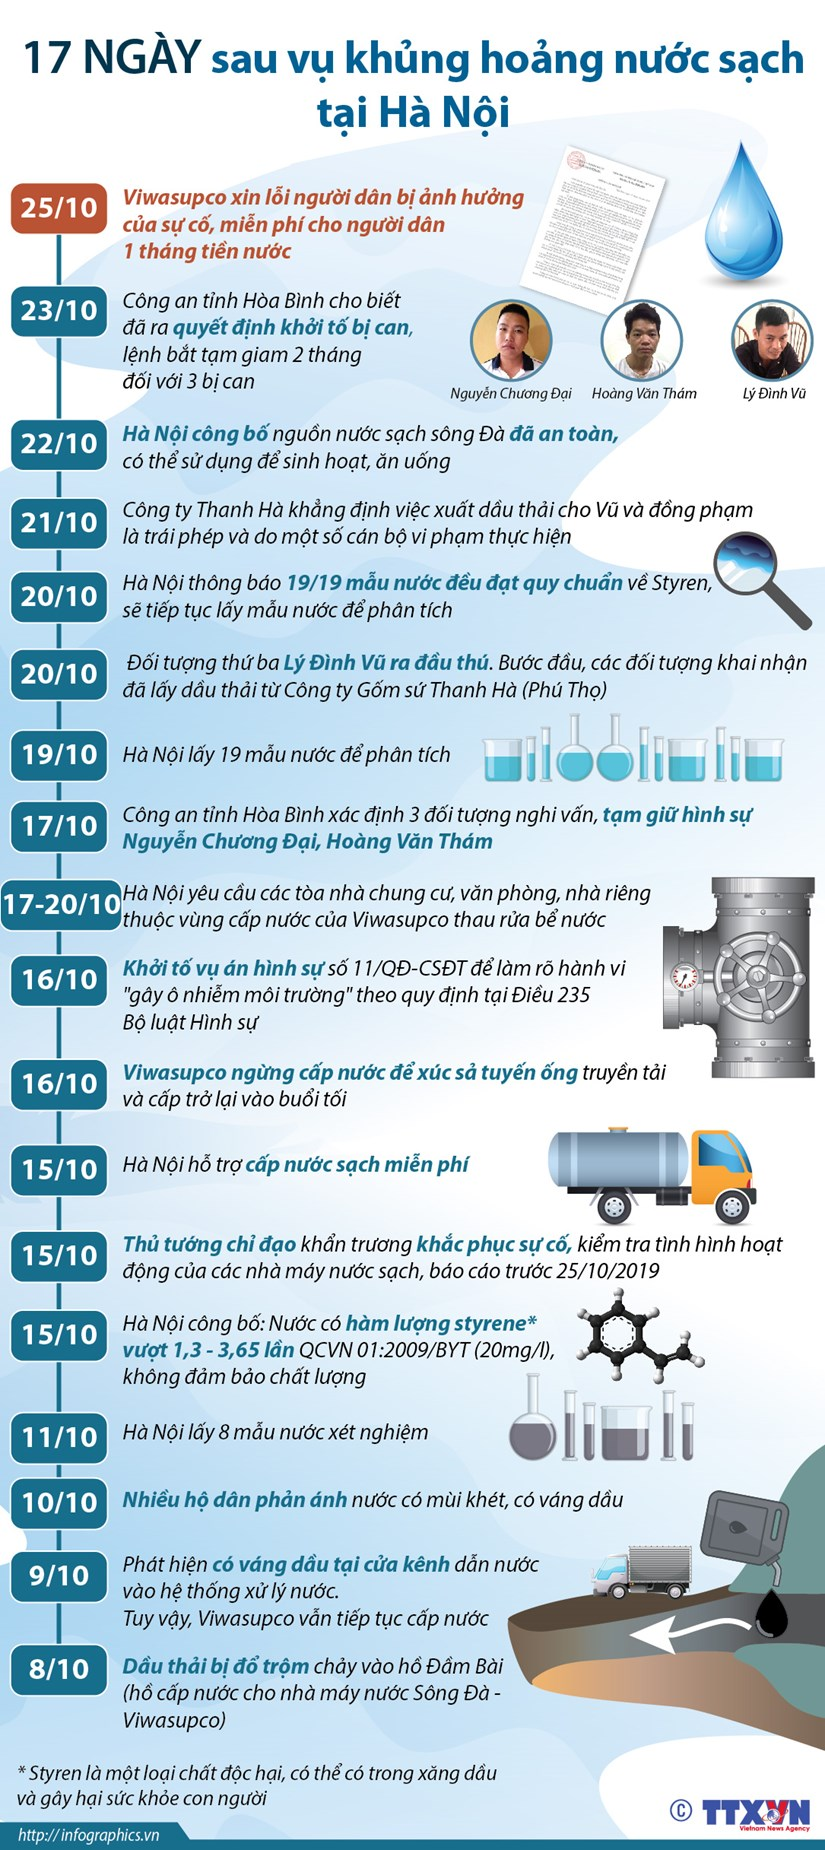 [Infographics] 17 ngay sau vu khung hoang nuoc sach tai Ha Noi hinh anh 1